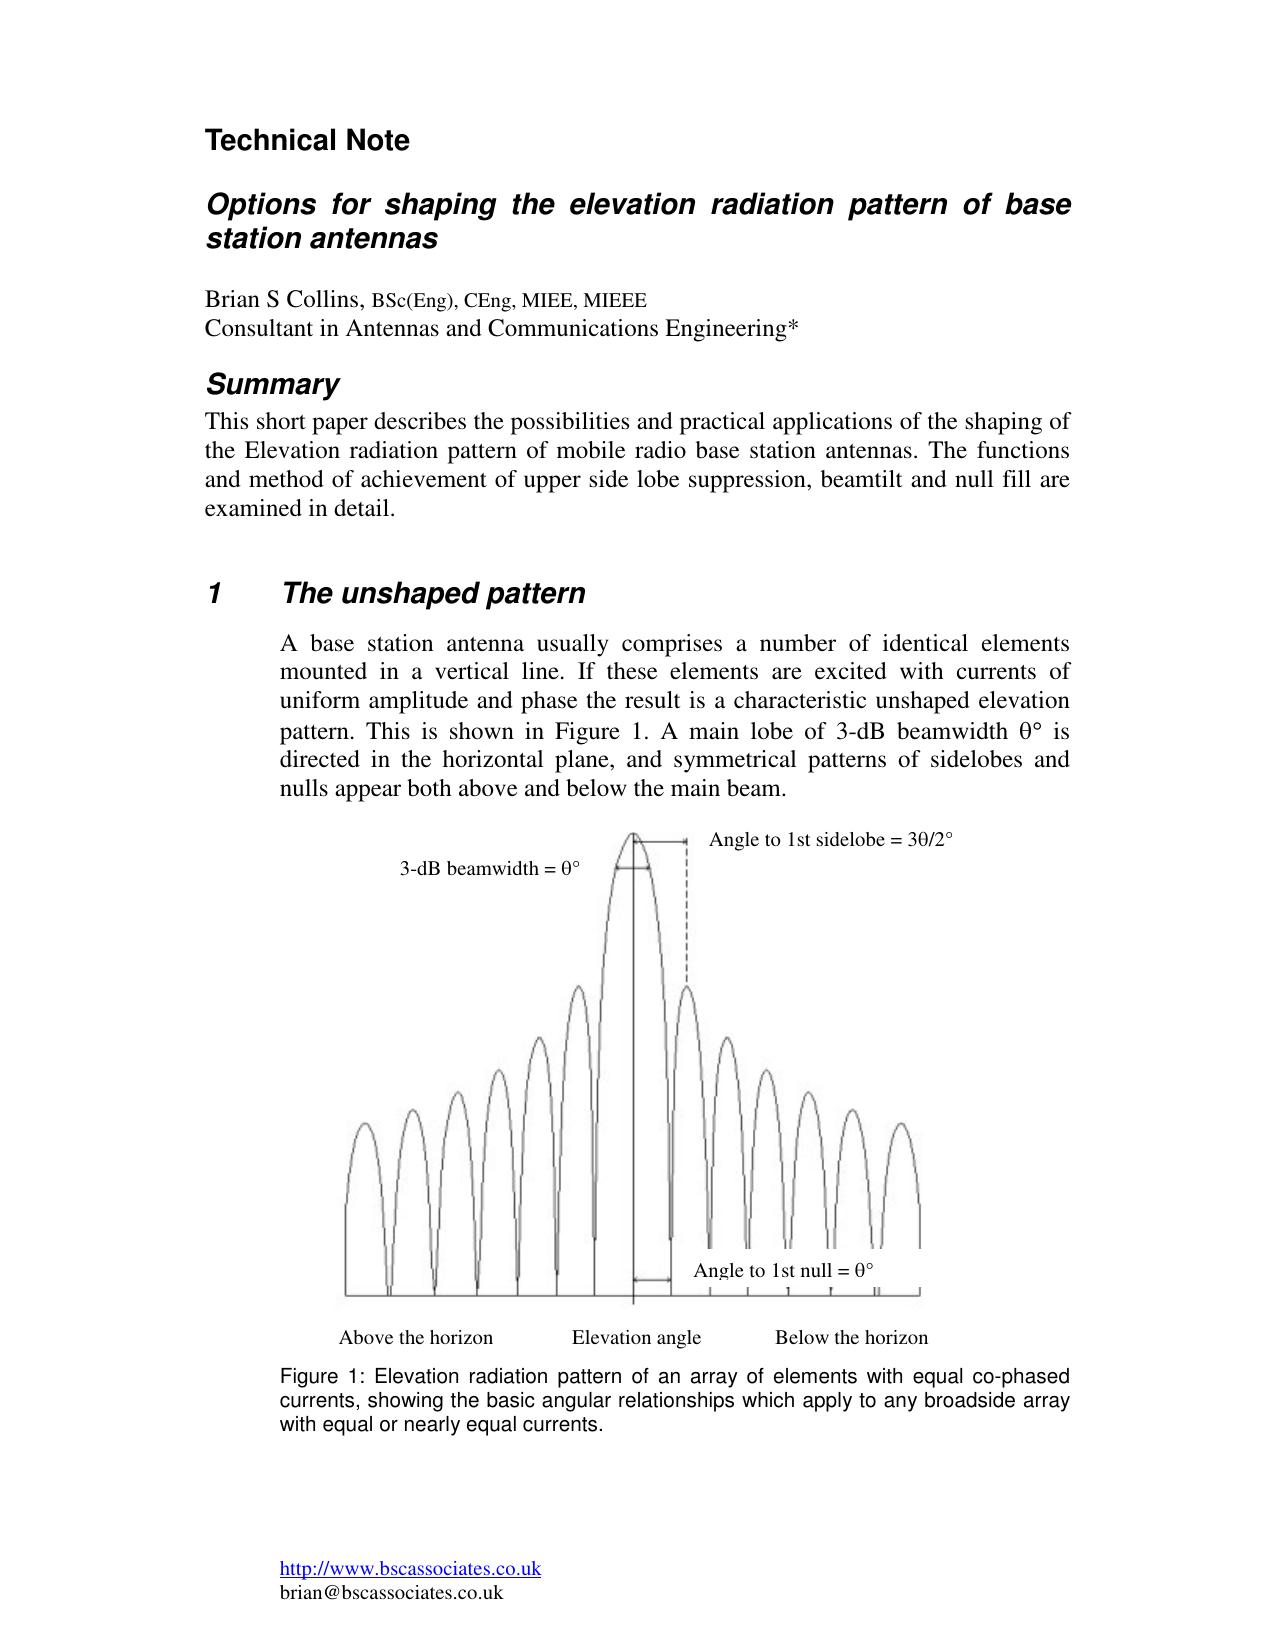 Shaping the elevation radiation pattern of base station antennas